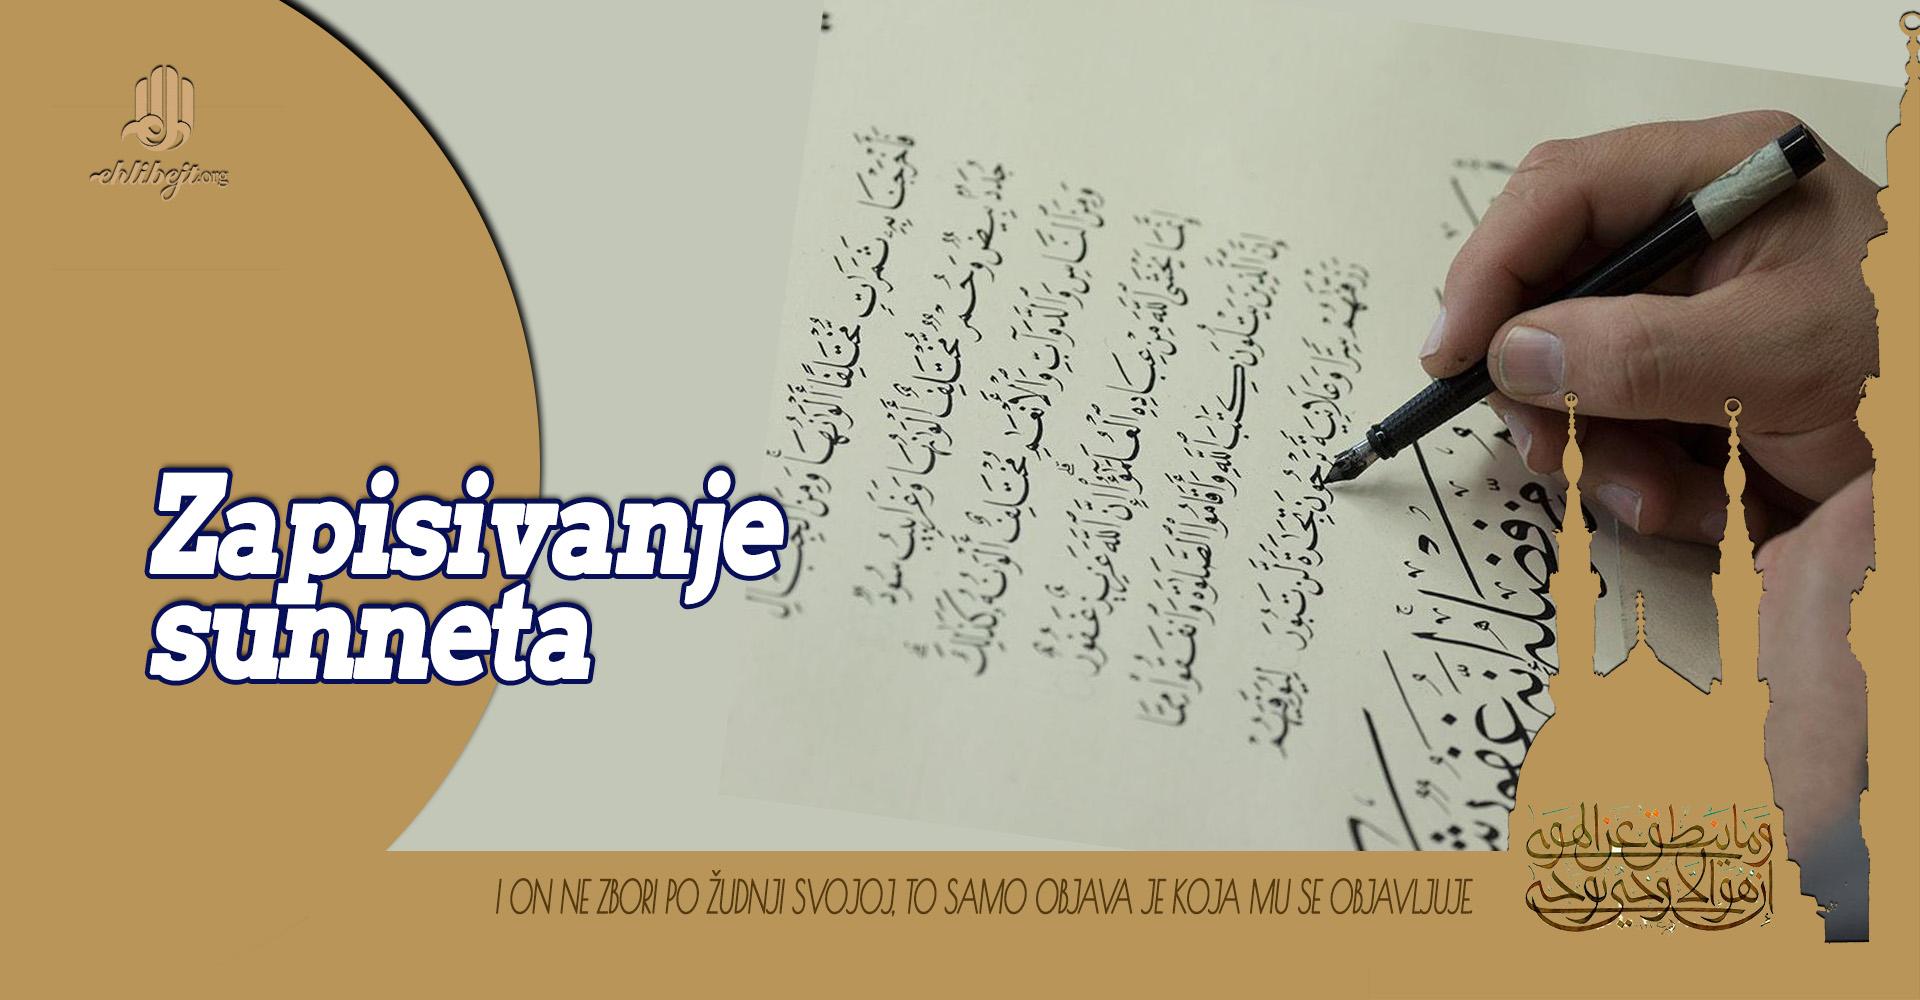 Zapisivanje sunneta